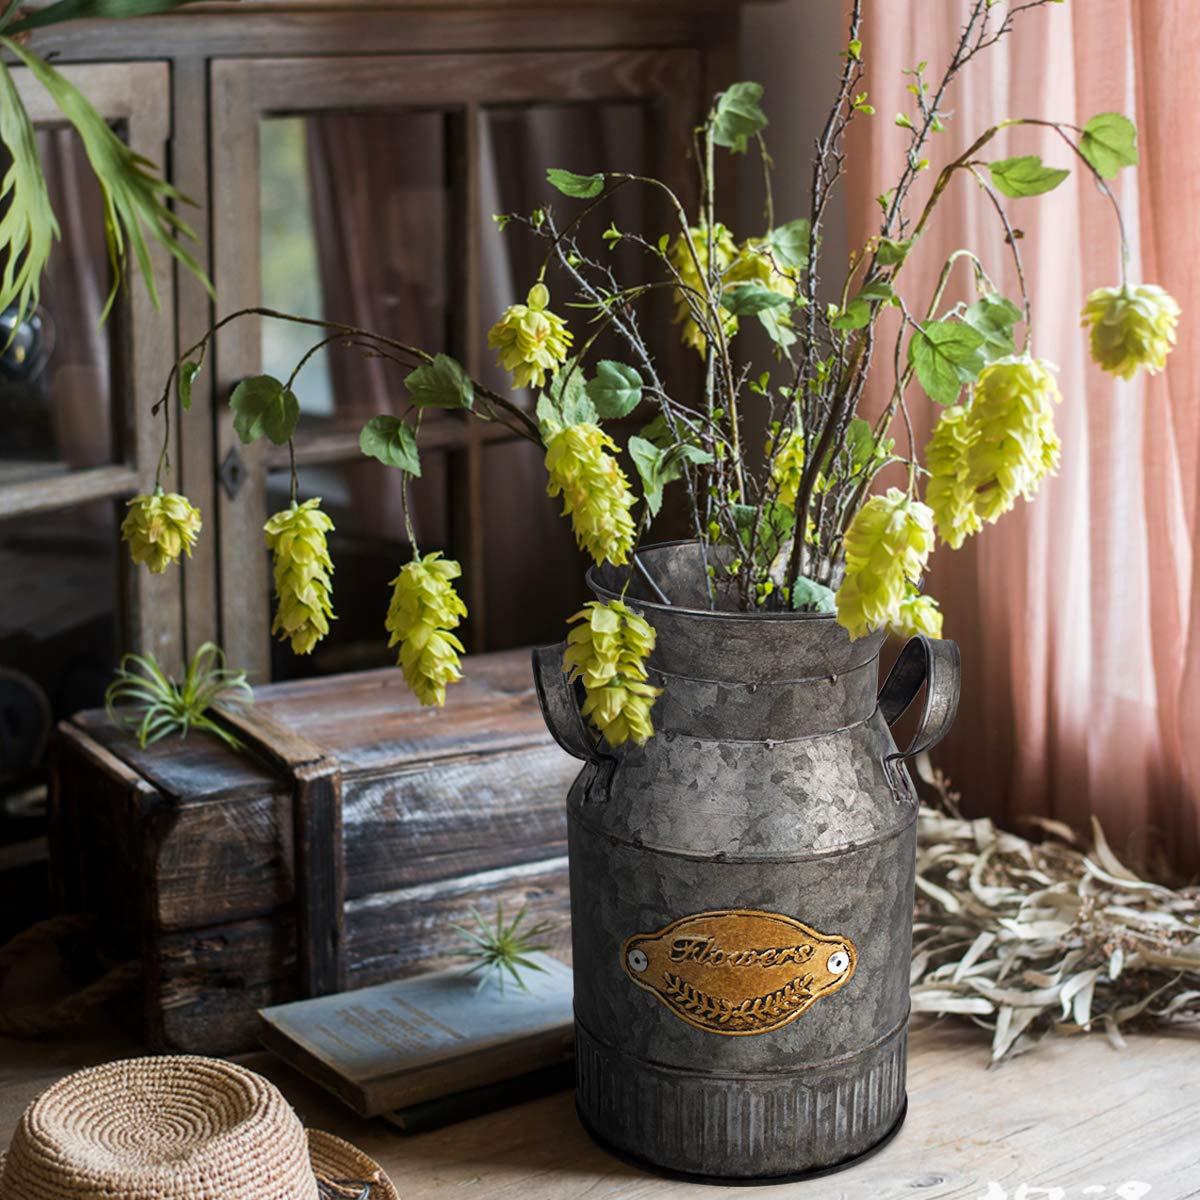 Vintage Farmhouse Jug Vase Milk Can Pitcher Galvanized Metal Rustic Vase Holder For Home Decor Topnew Shabby Chic Flower Vase Home Kitchen Vases